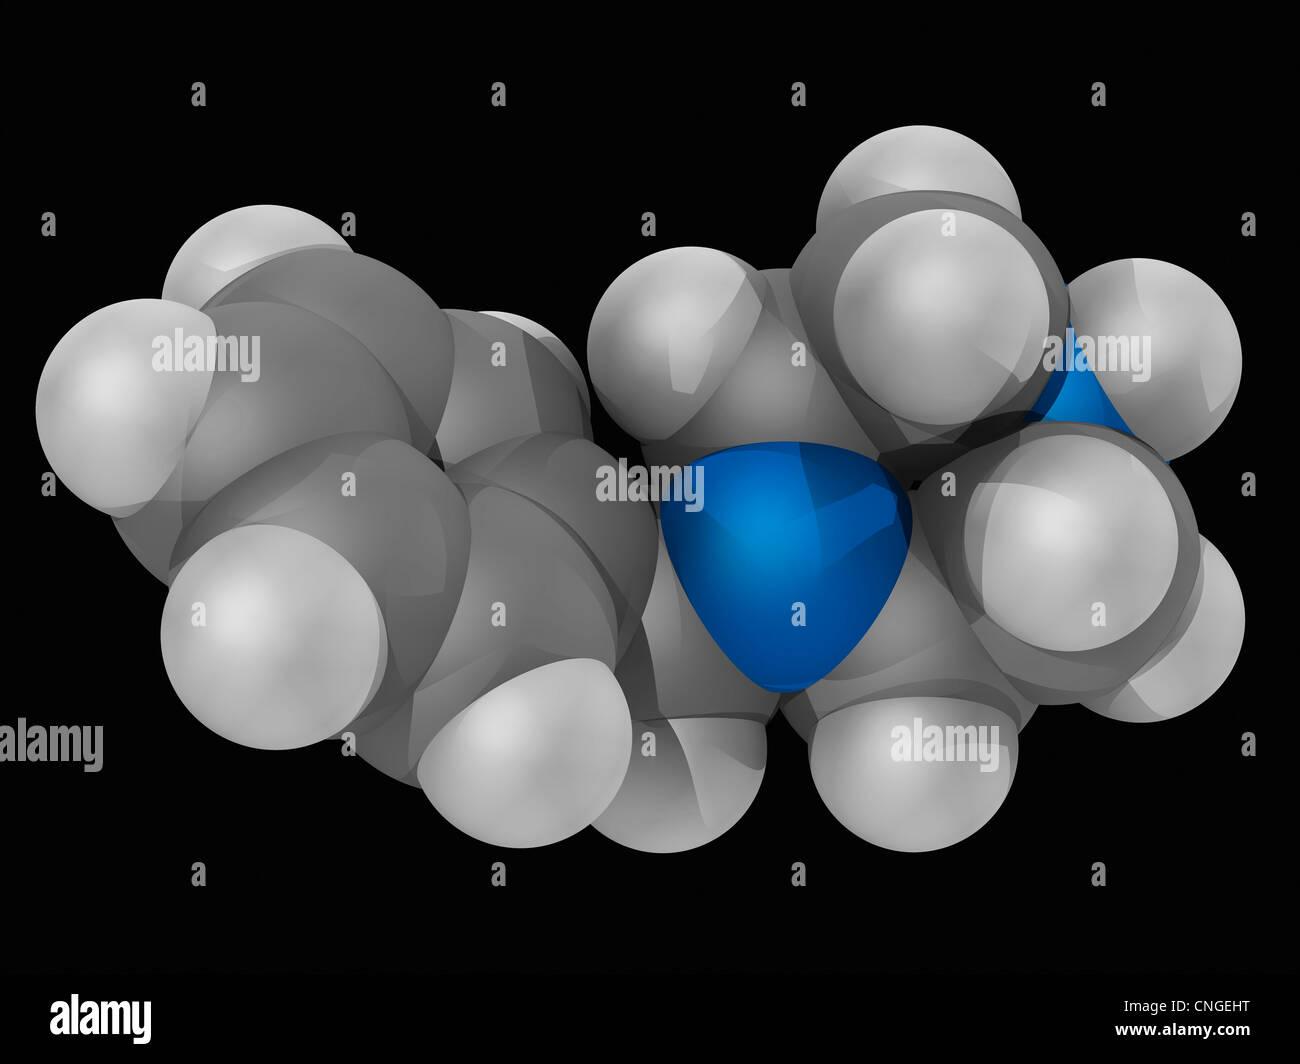 Benzylpiperazine (BZB) drug molecule - Stock Image